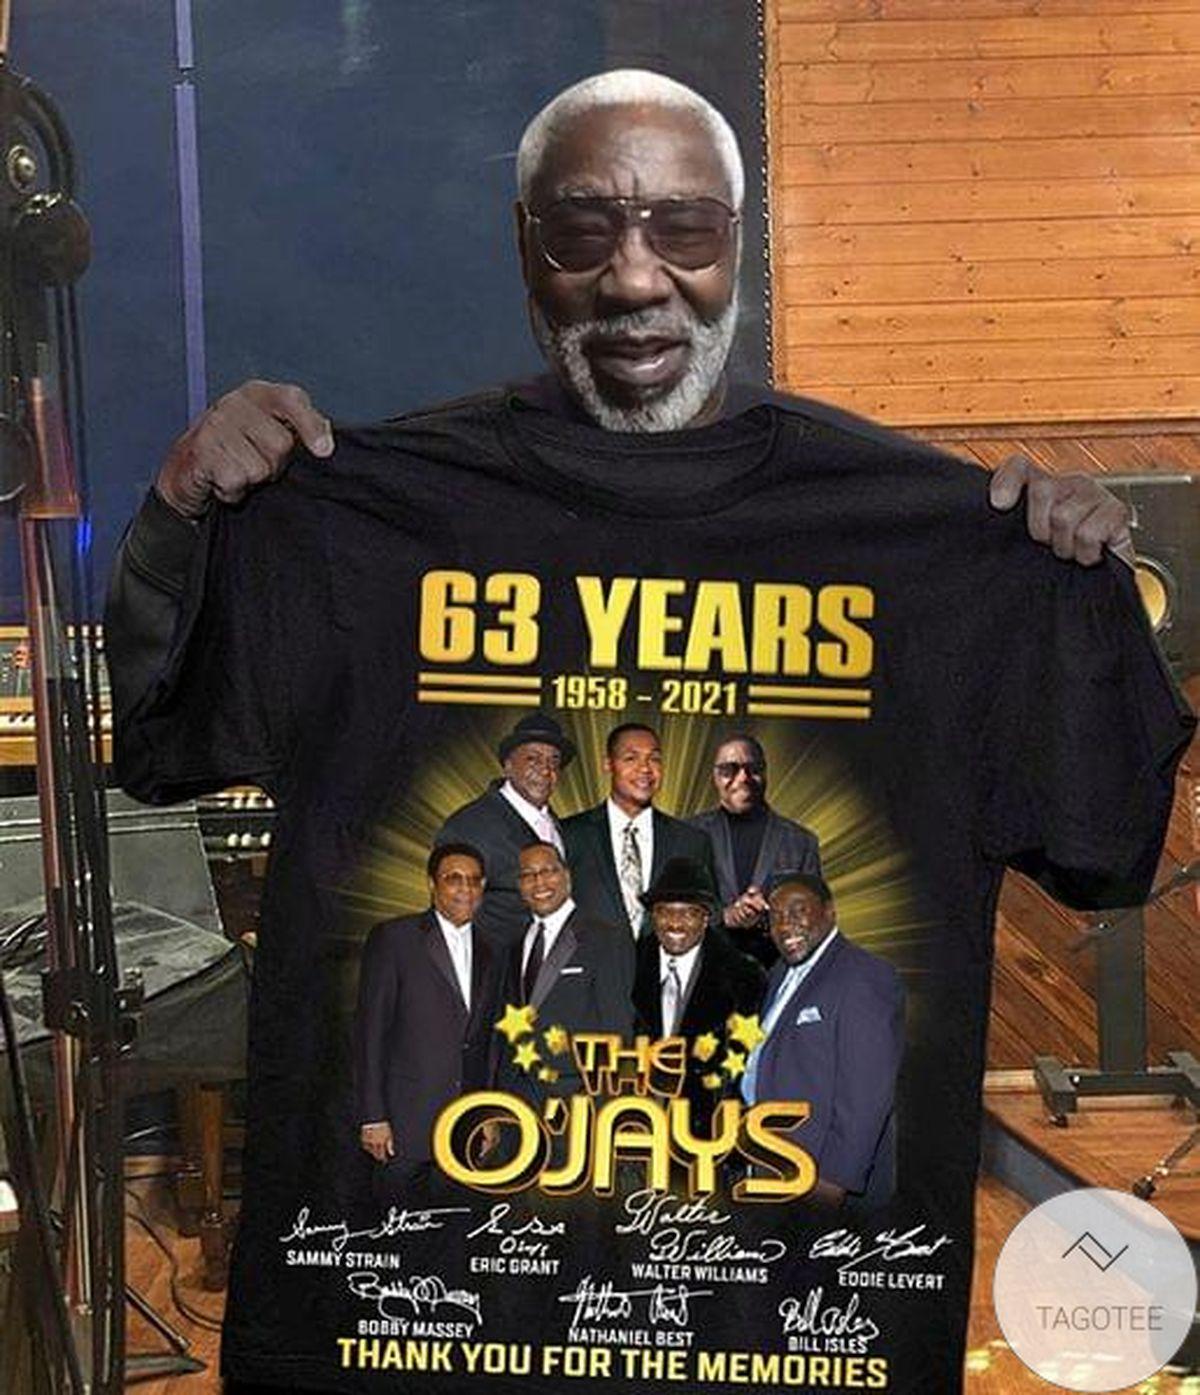 Present The O'jays 63 Years Anniversary 1958 2021 Shirt, hoodie, tank top